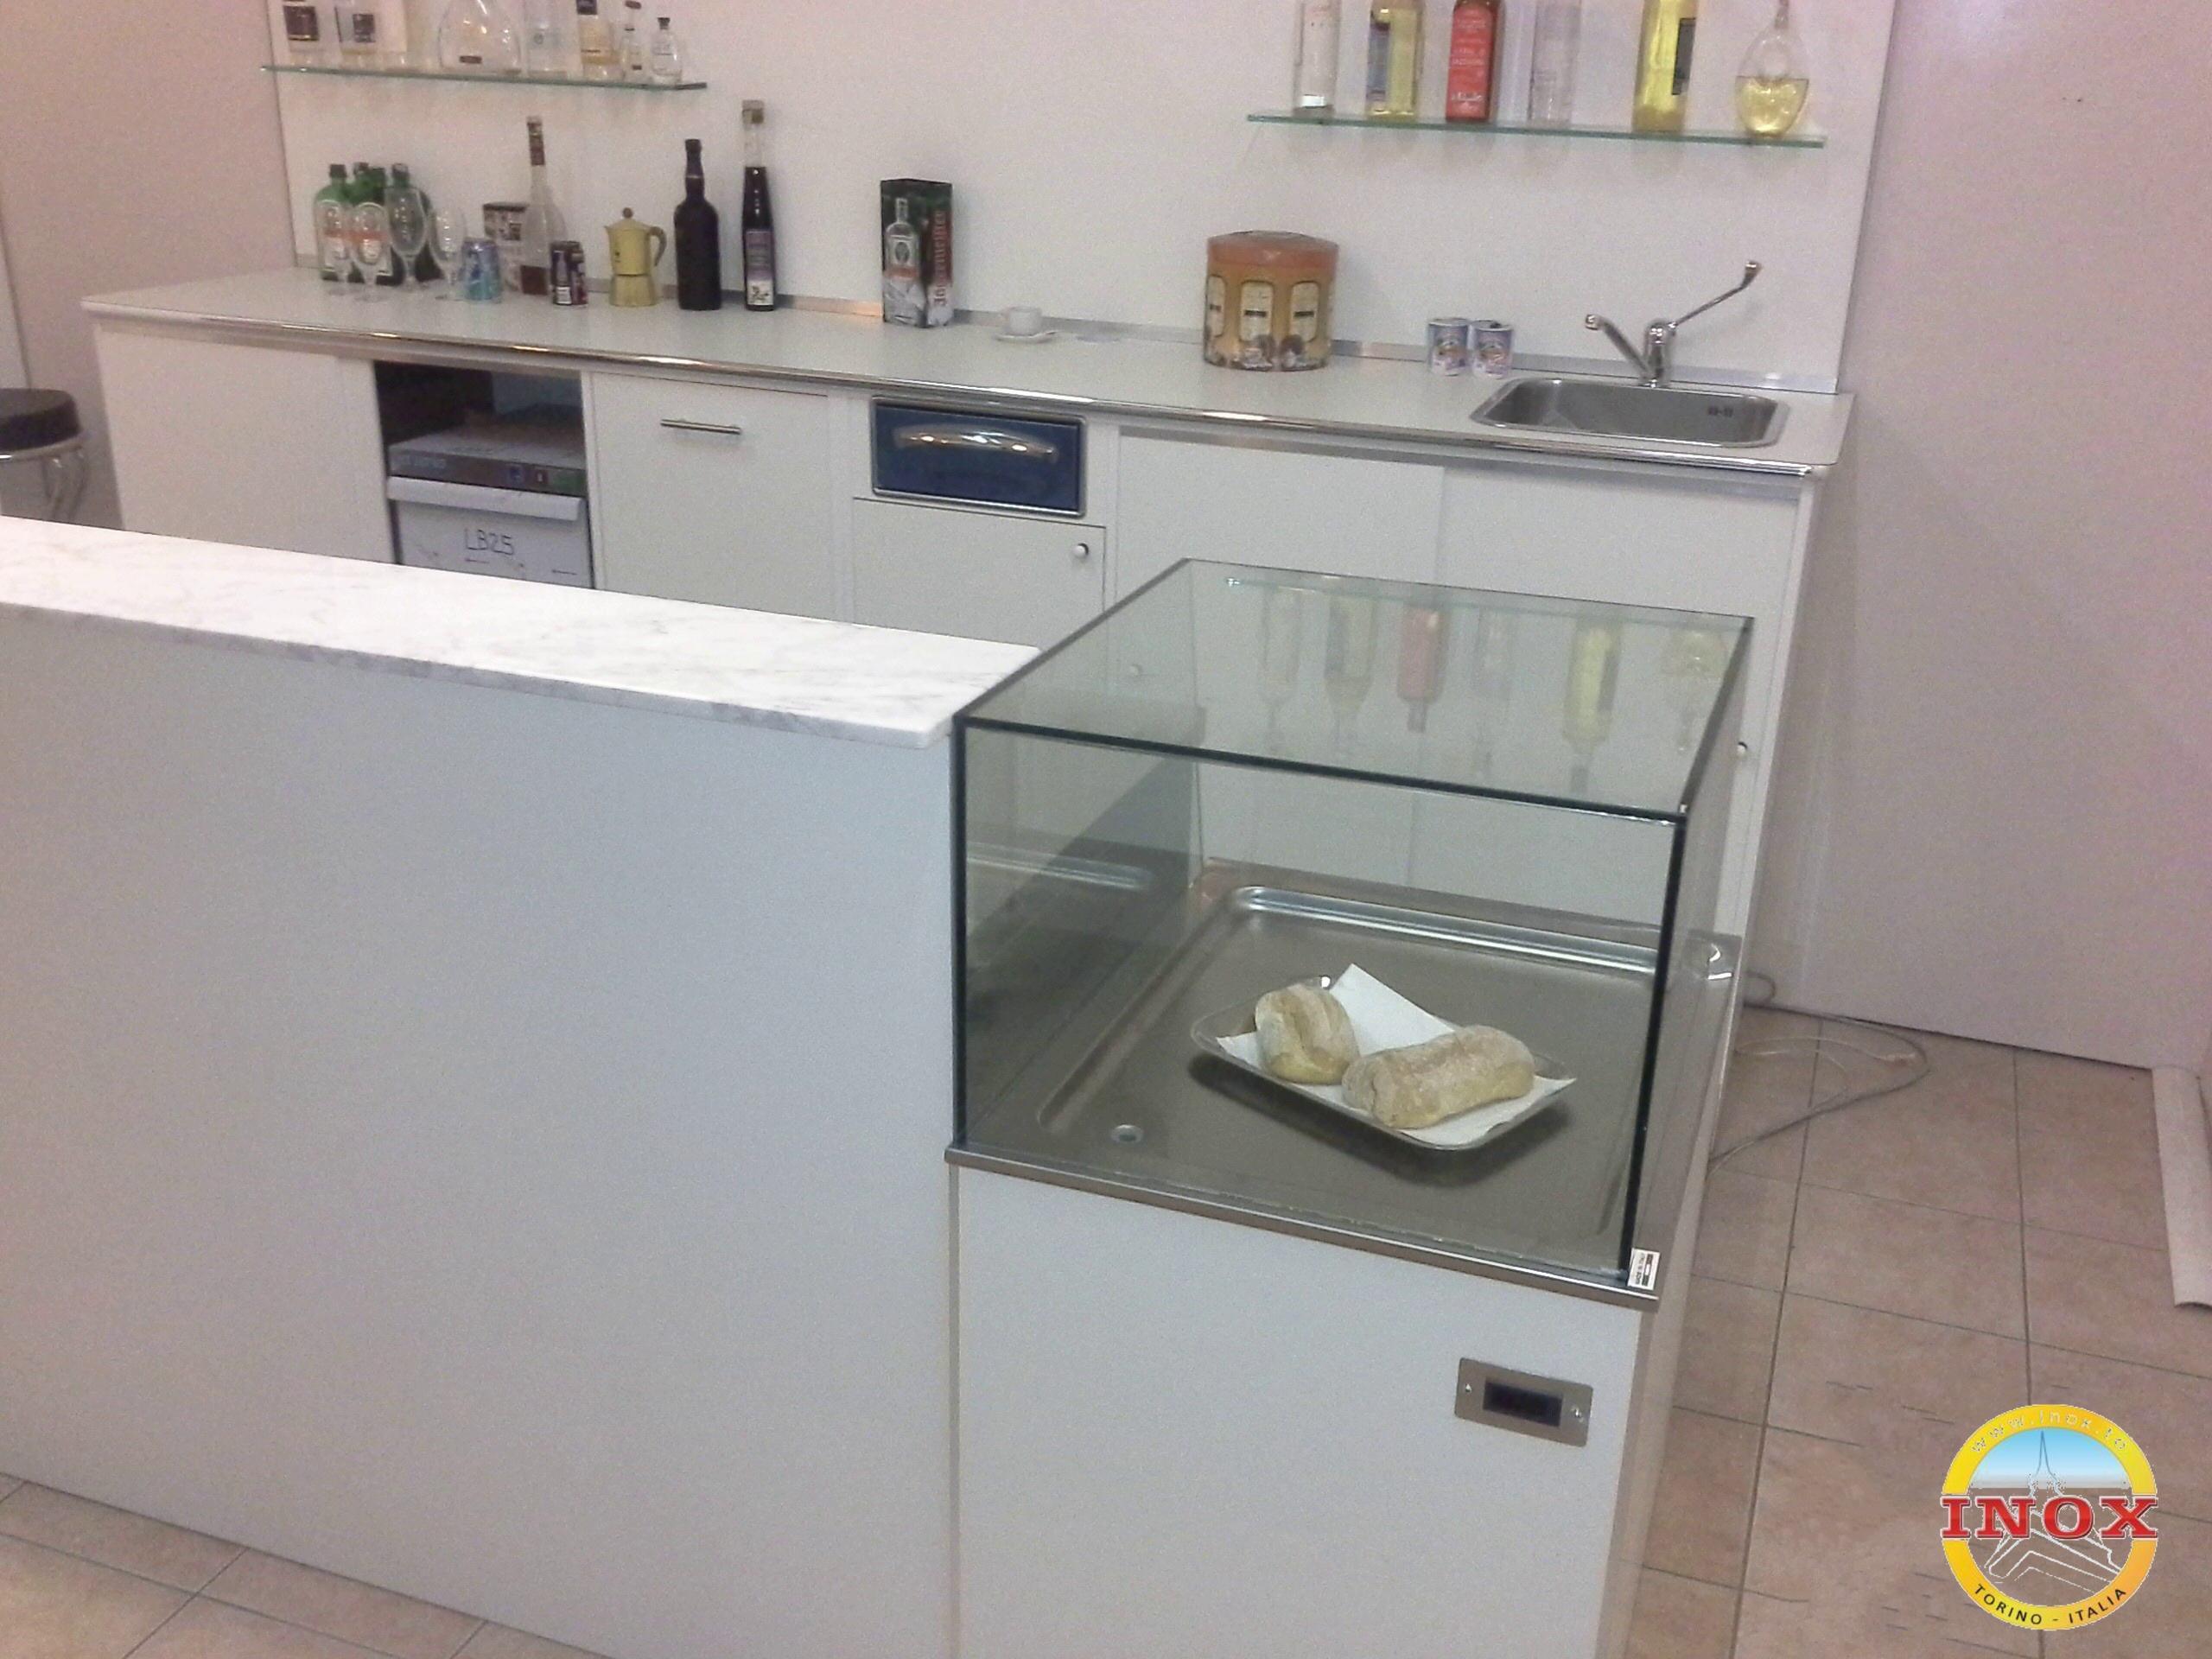 Arredamenti per Bar Negozi Ristoranti, banchi frigo, banchi bar ...